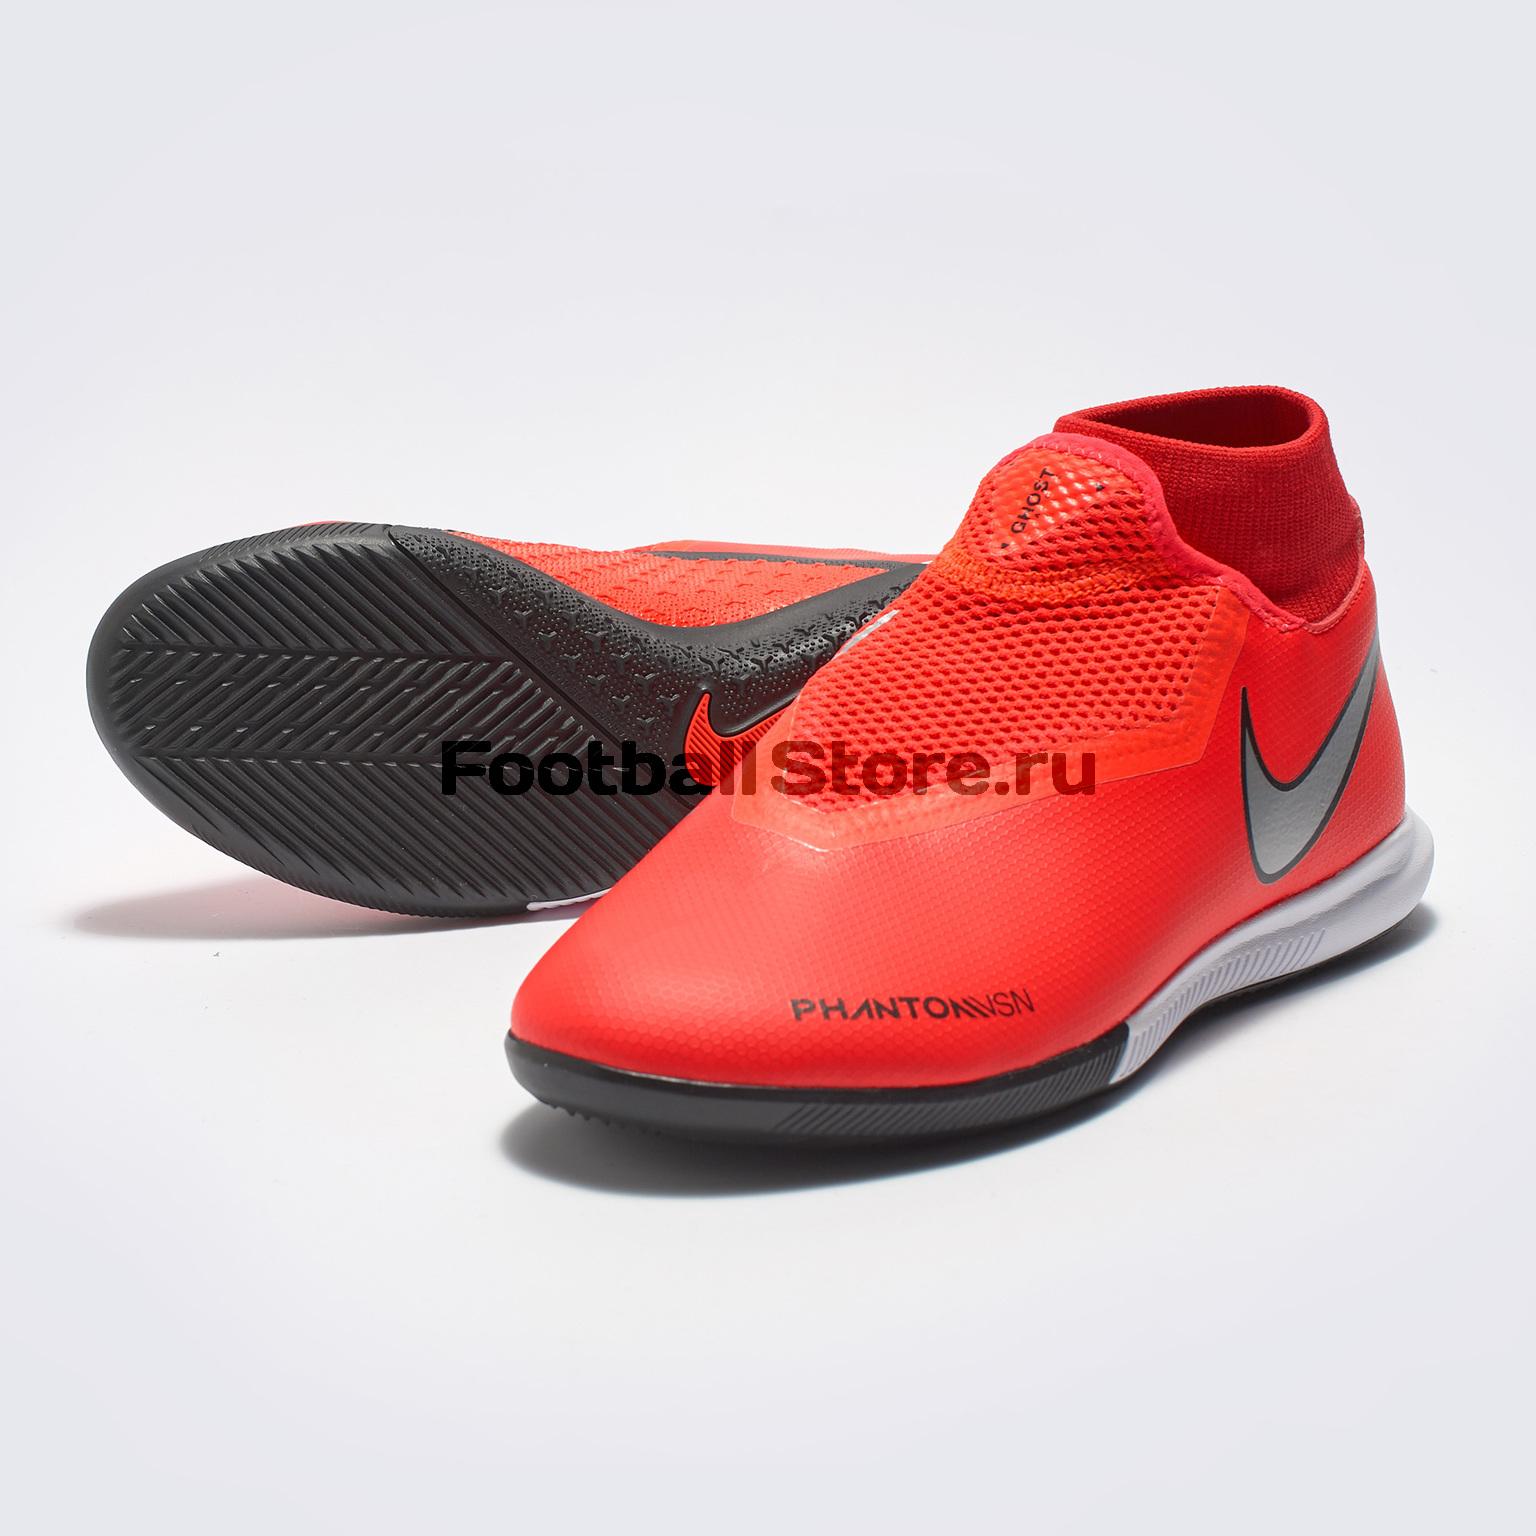 Футзалки Nike Phantom Vision Academy DF IC AO3267-600 бра idlamp 351 1a chrome